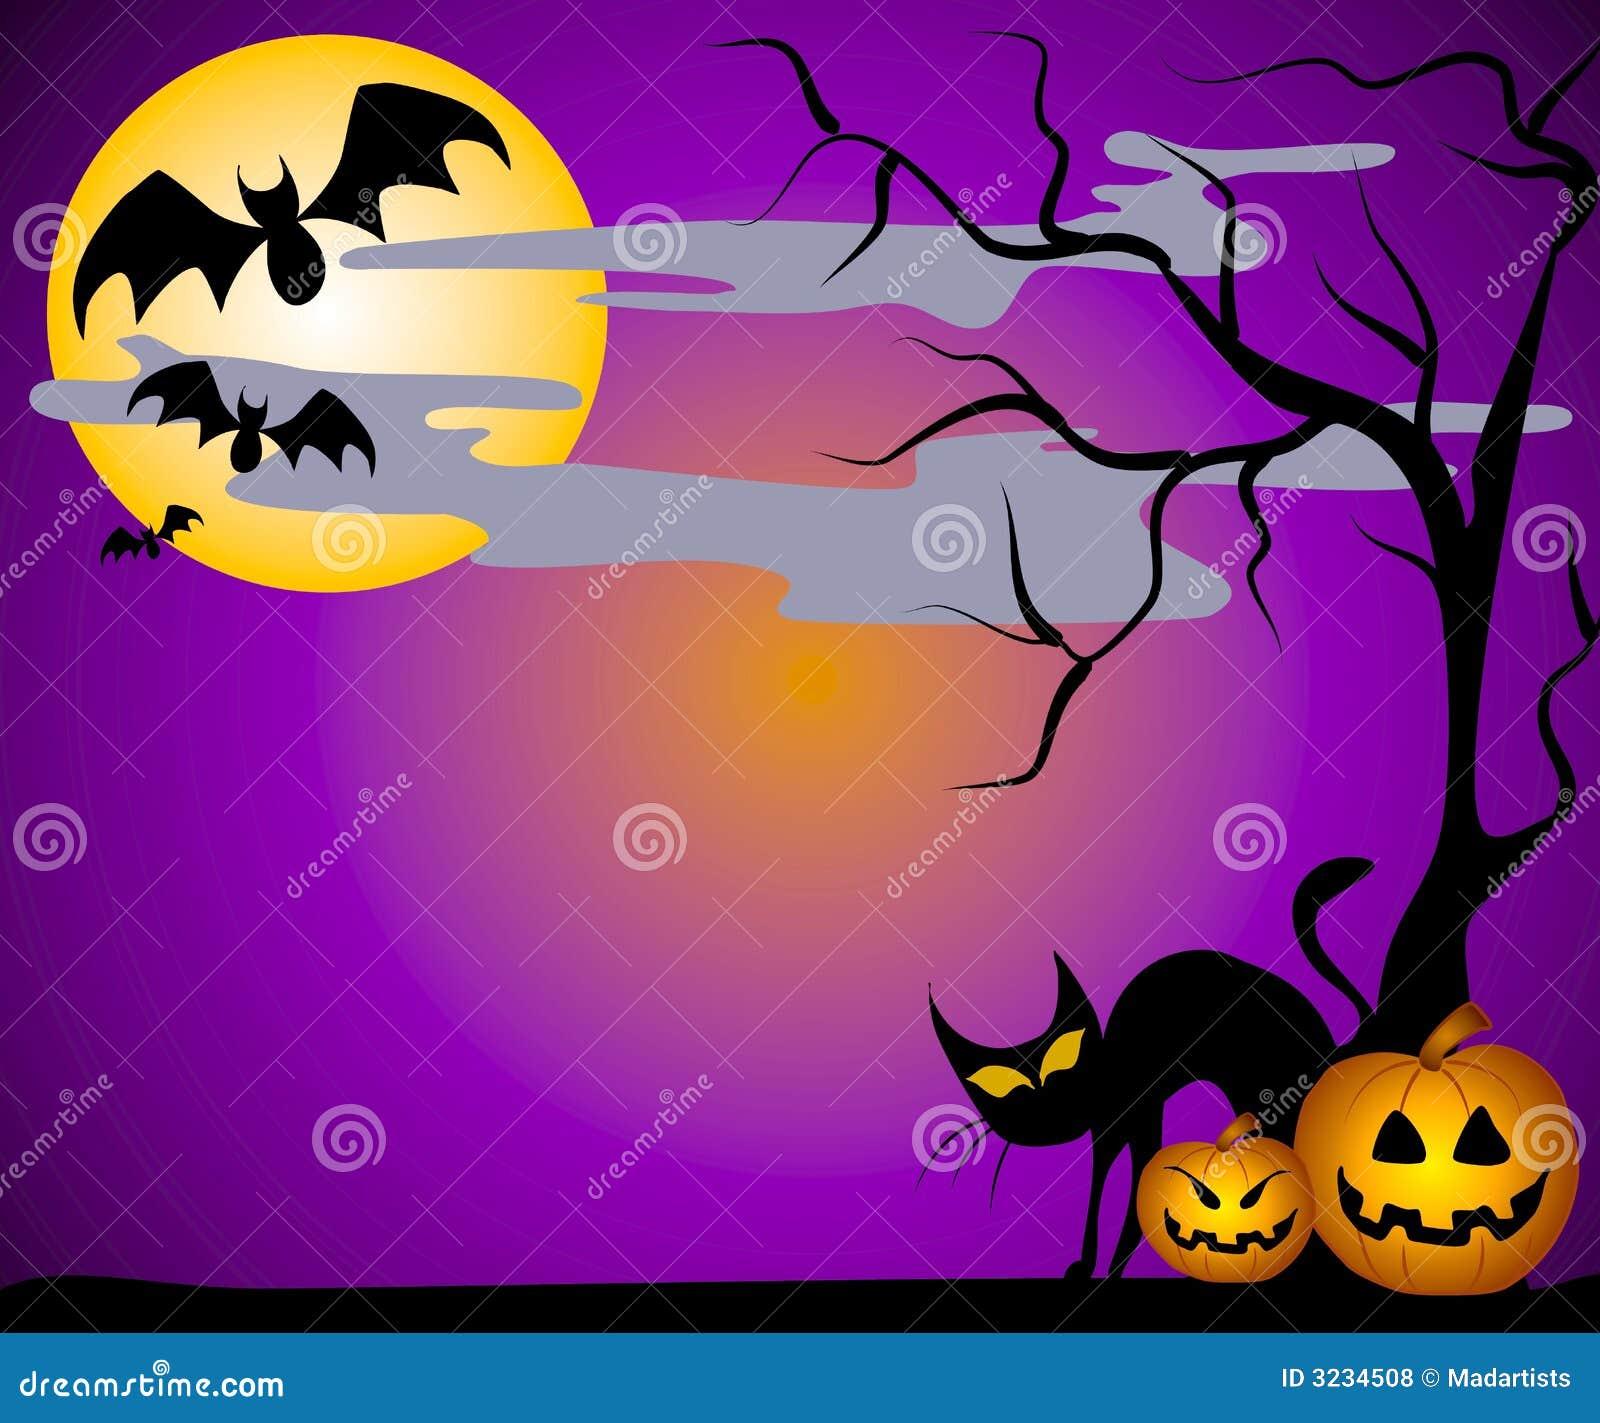 Jack O Lanterns Bats And Cats Royalty Free Stock Photos ...